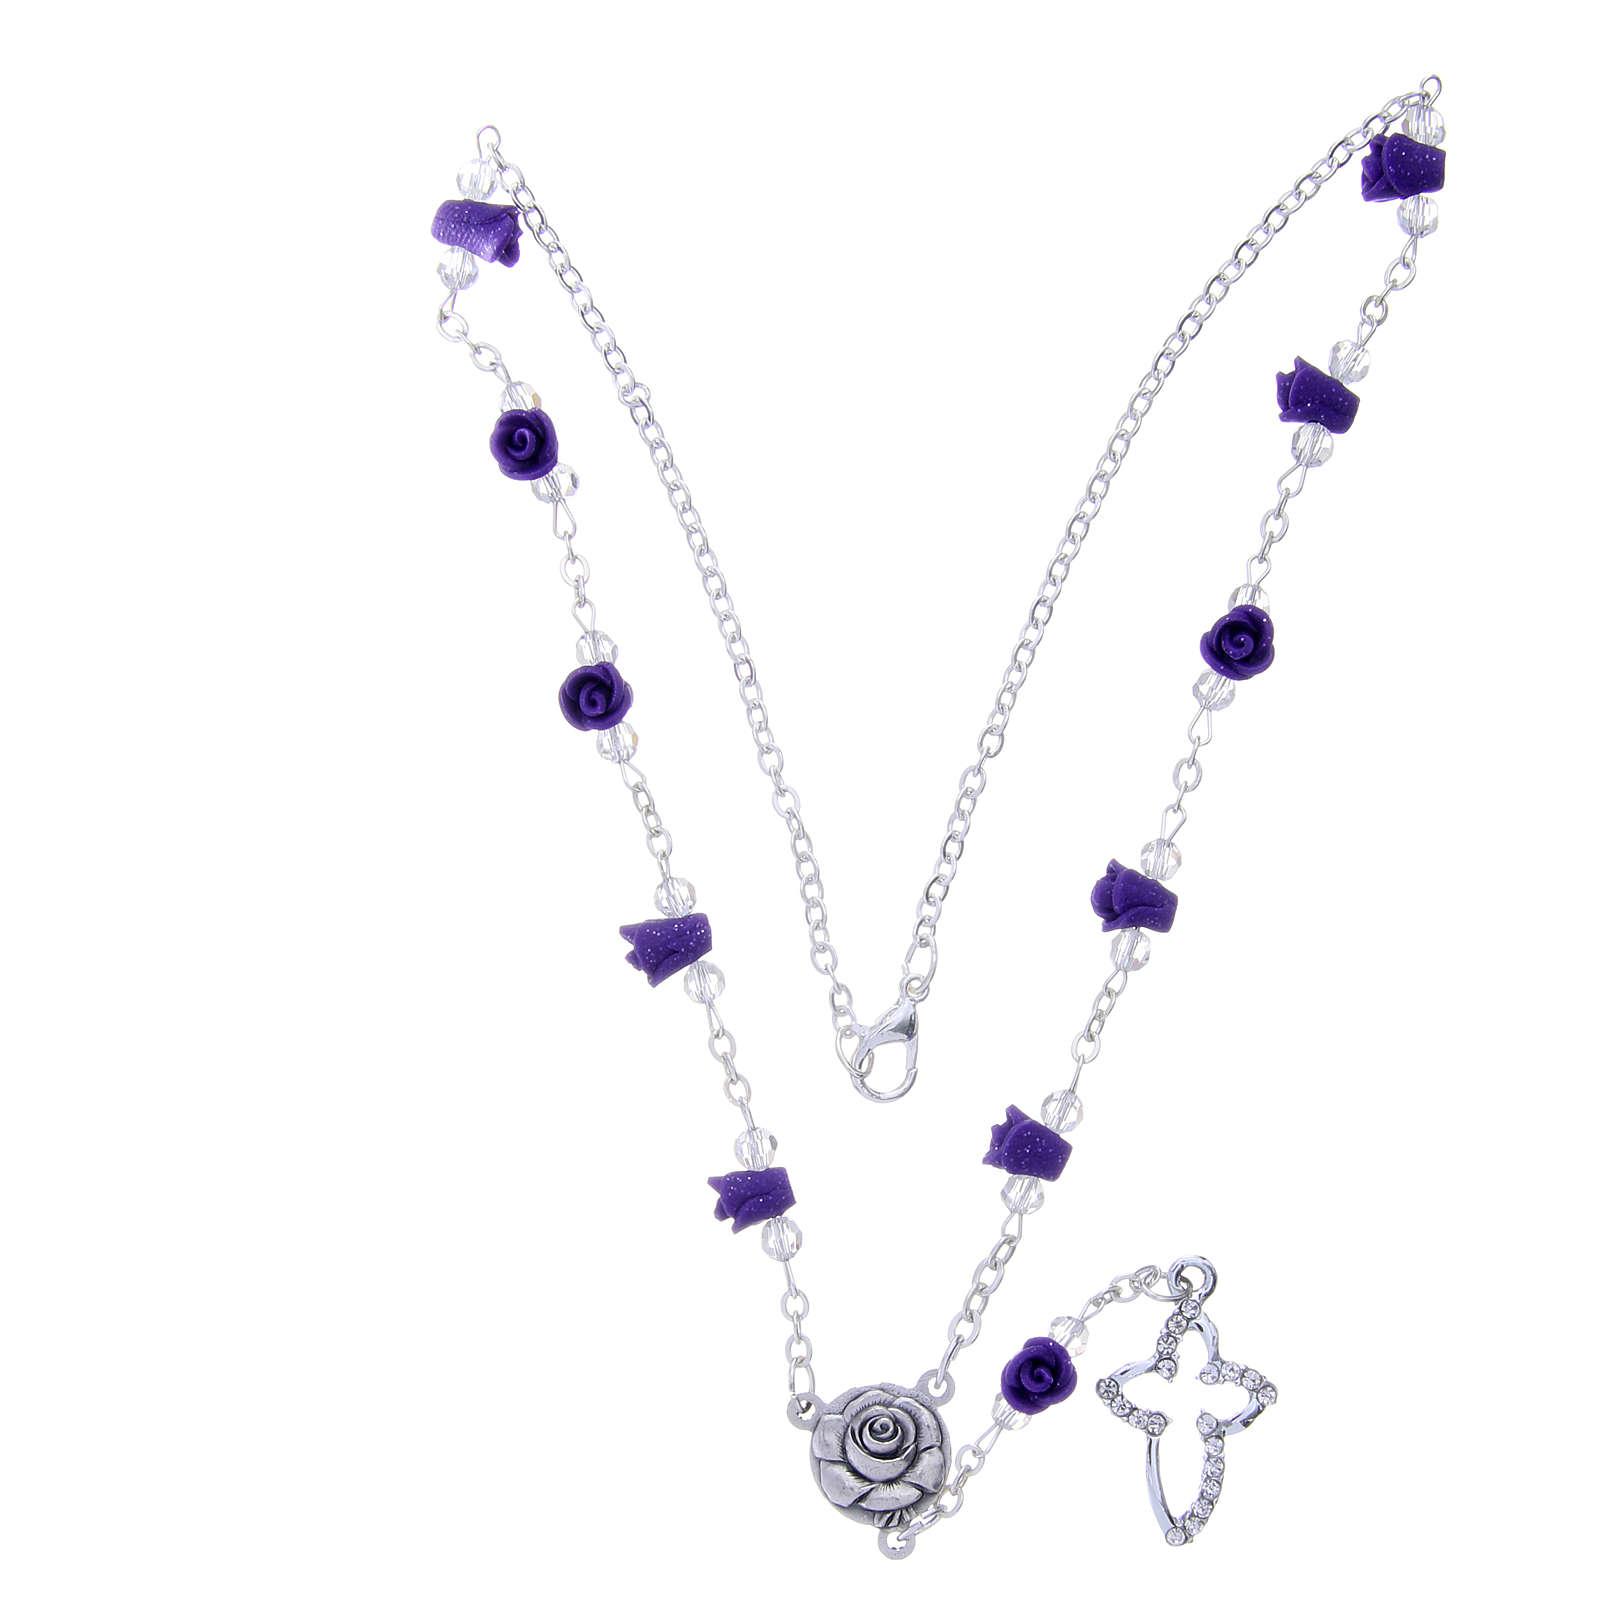 Collier chapelet Medjugorje roses céramique violet et grains 4